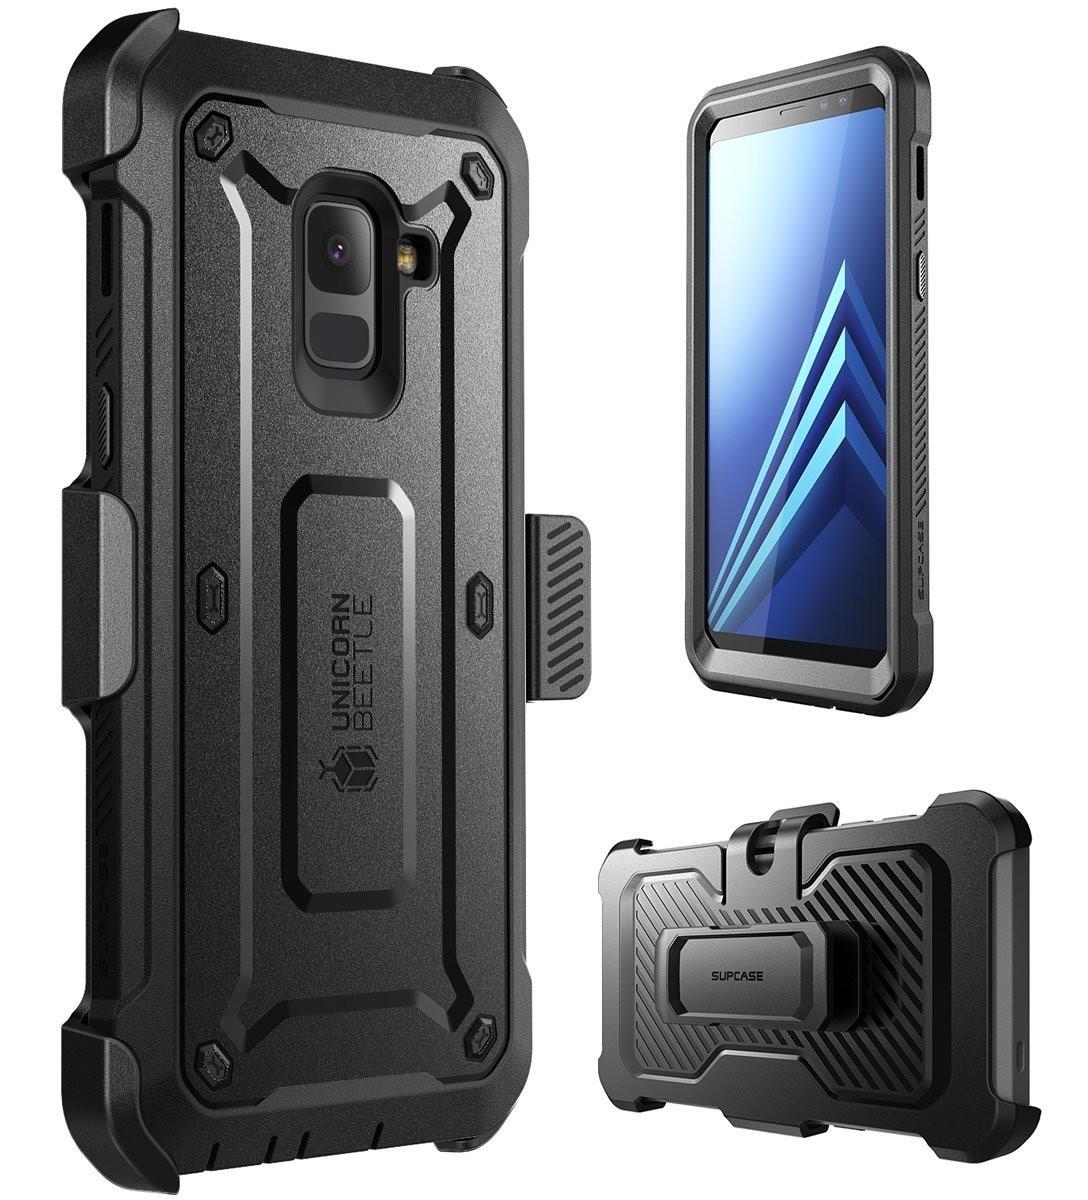 Case Galaxy A8 plus Protector USA Extremo Supcase Armadura